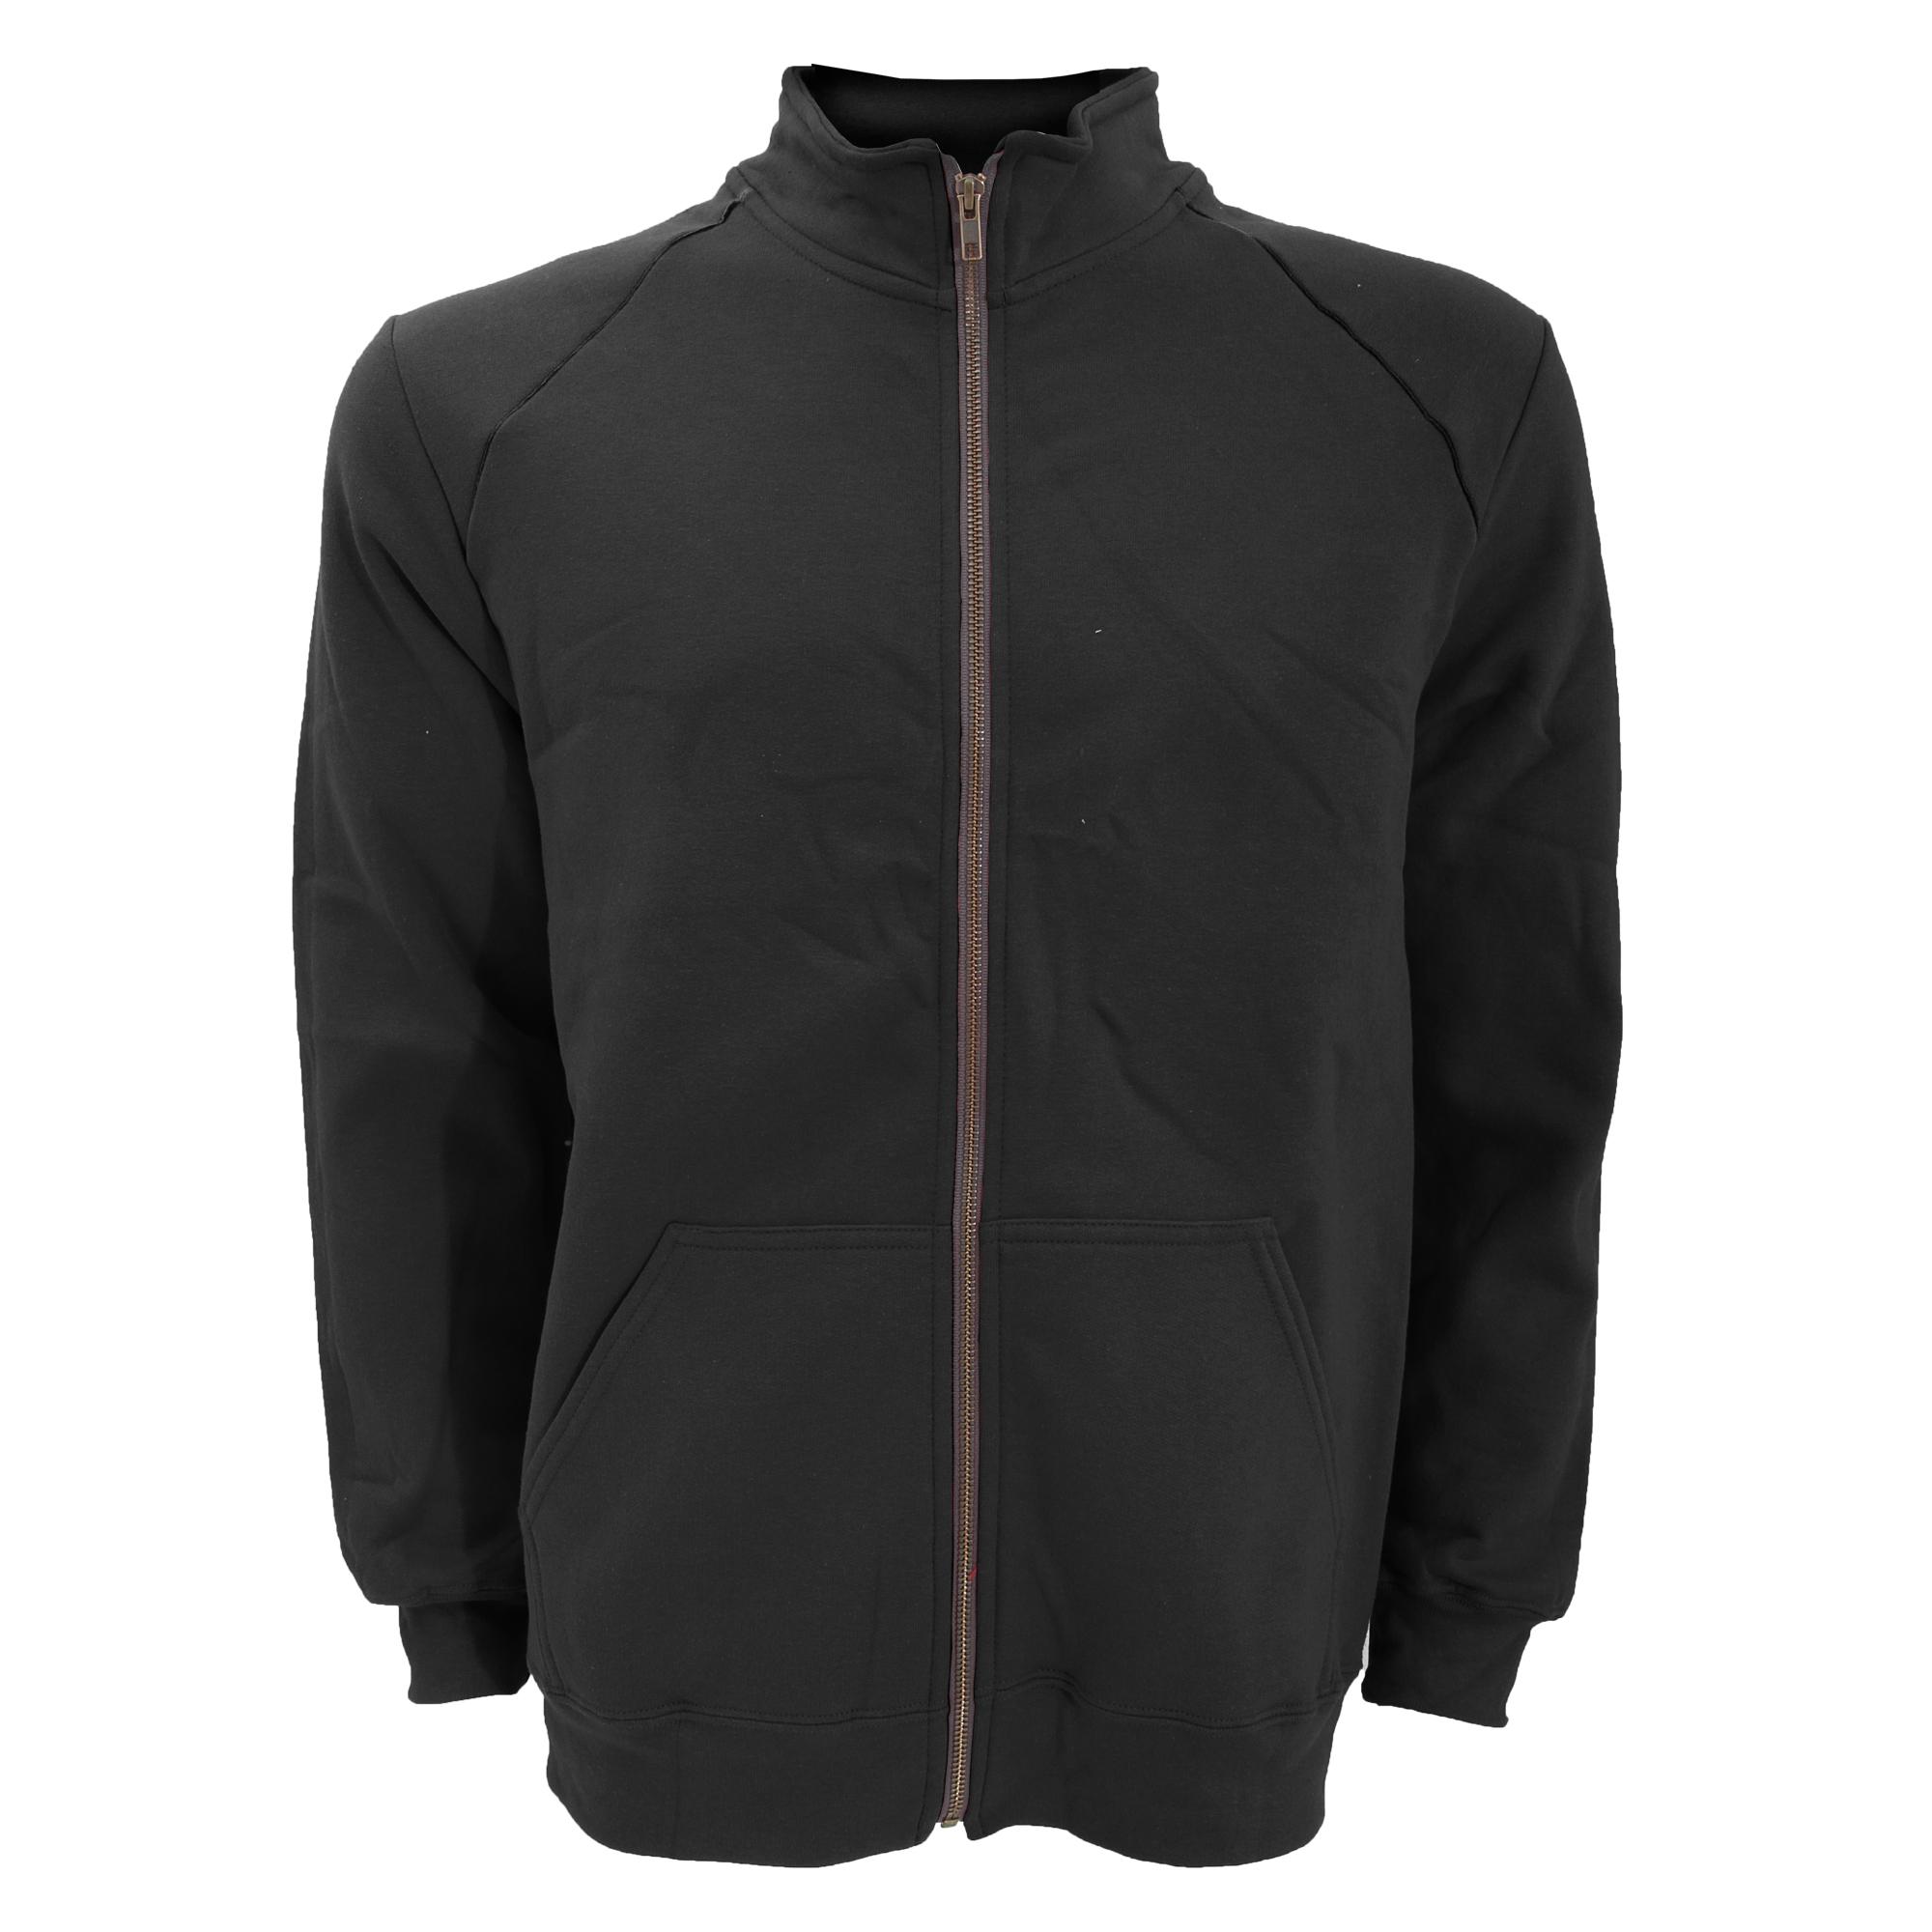 Gildan-Mens-Premium-Cotton-Ringspun-Fleece-Full-Zip-Jacket-L-S-M-2XL-RW3172 thumbnail 2